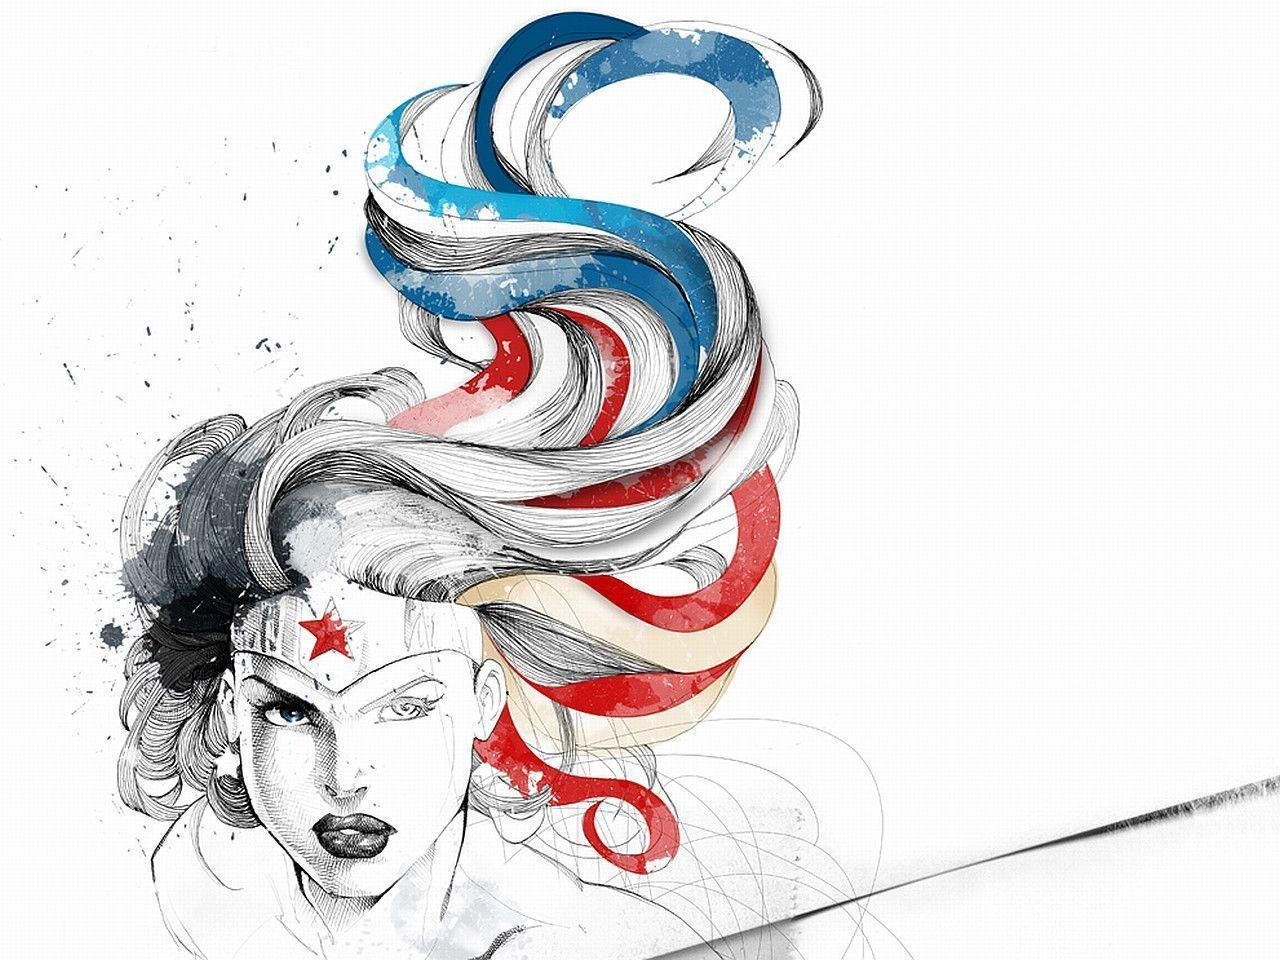 Wonder Woman Computer Wallpapers, Desktop Backgrounds 1280x960 Id ...